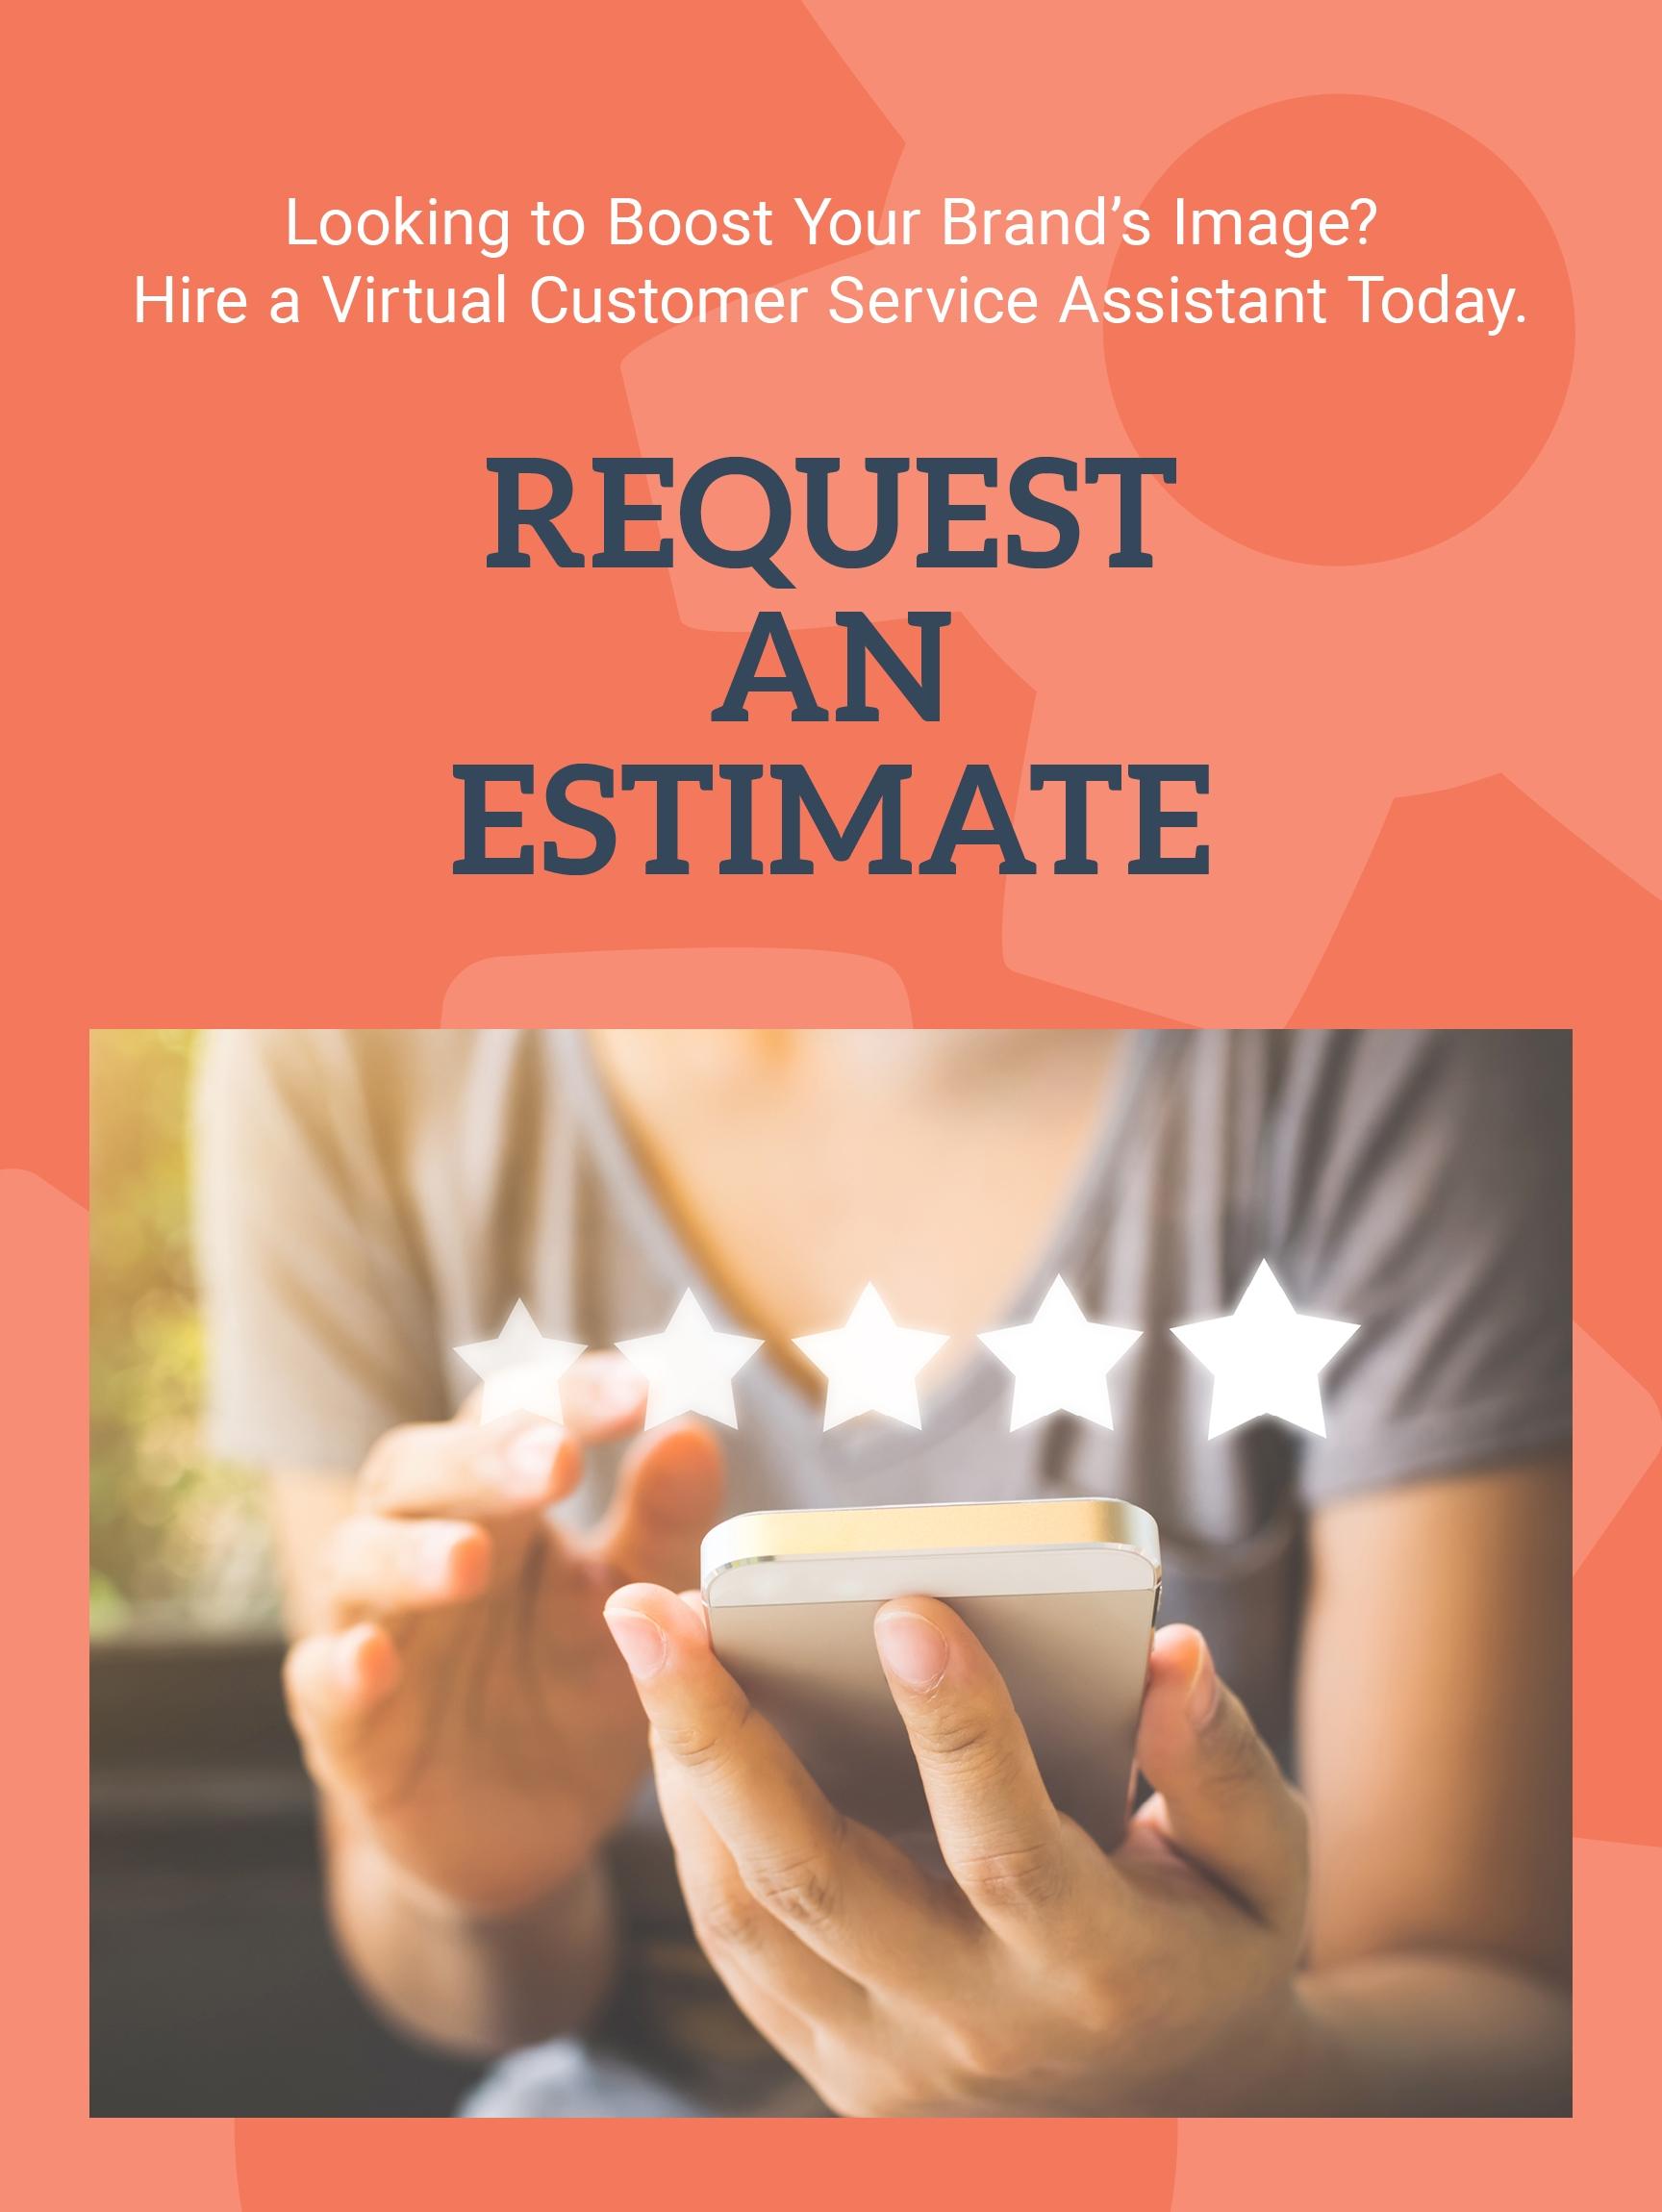 Request a Virtual Customer Service Assistant Estimate